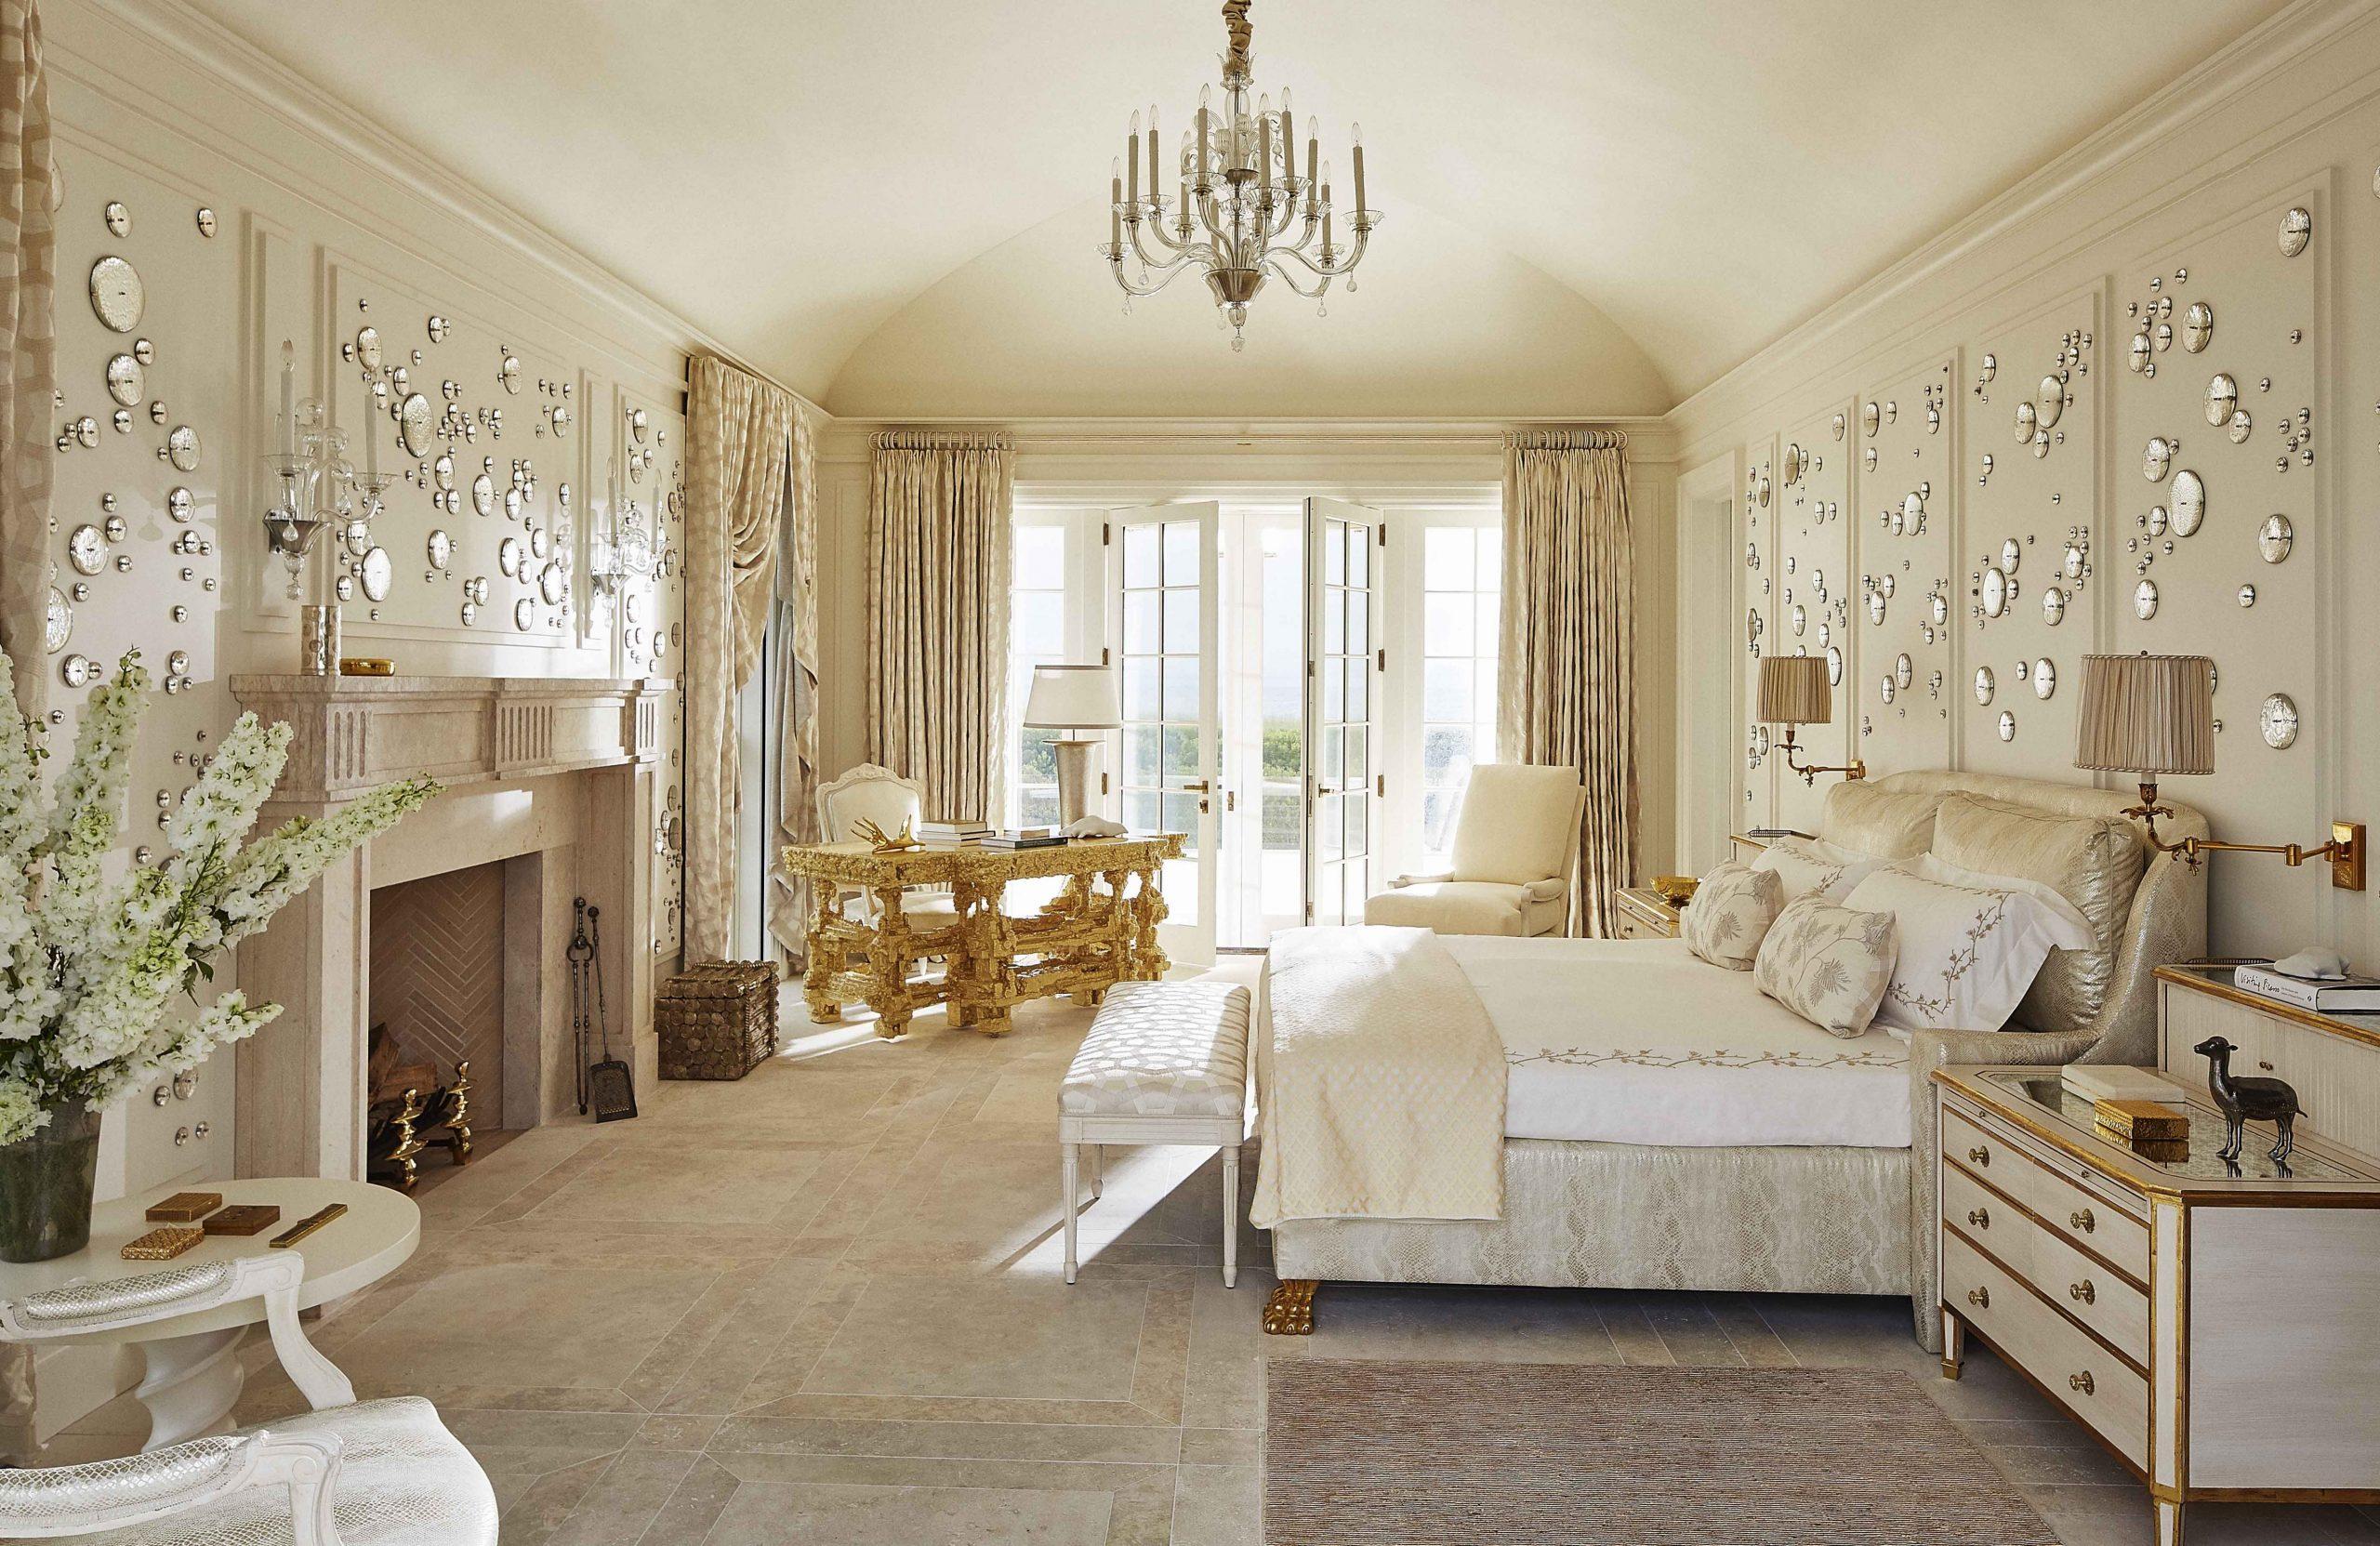 9+ Best Bedroom Ideas - Beautiful Bedroom Decorating Tips - Bedroom Ideas Master